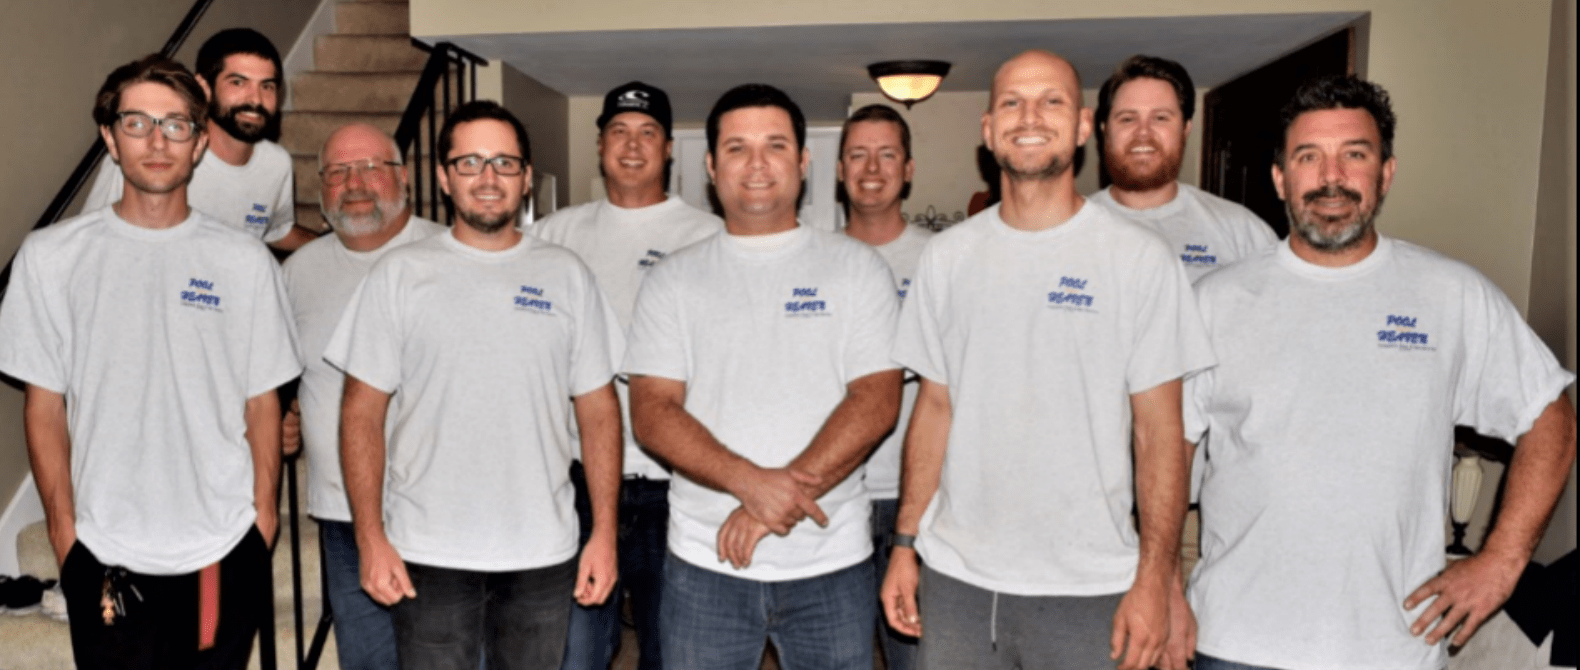 Huntington Beach Pool Service Policies